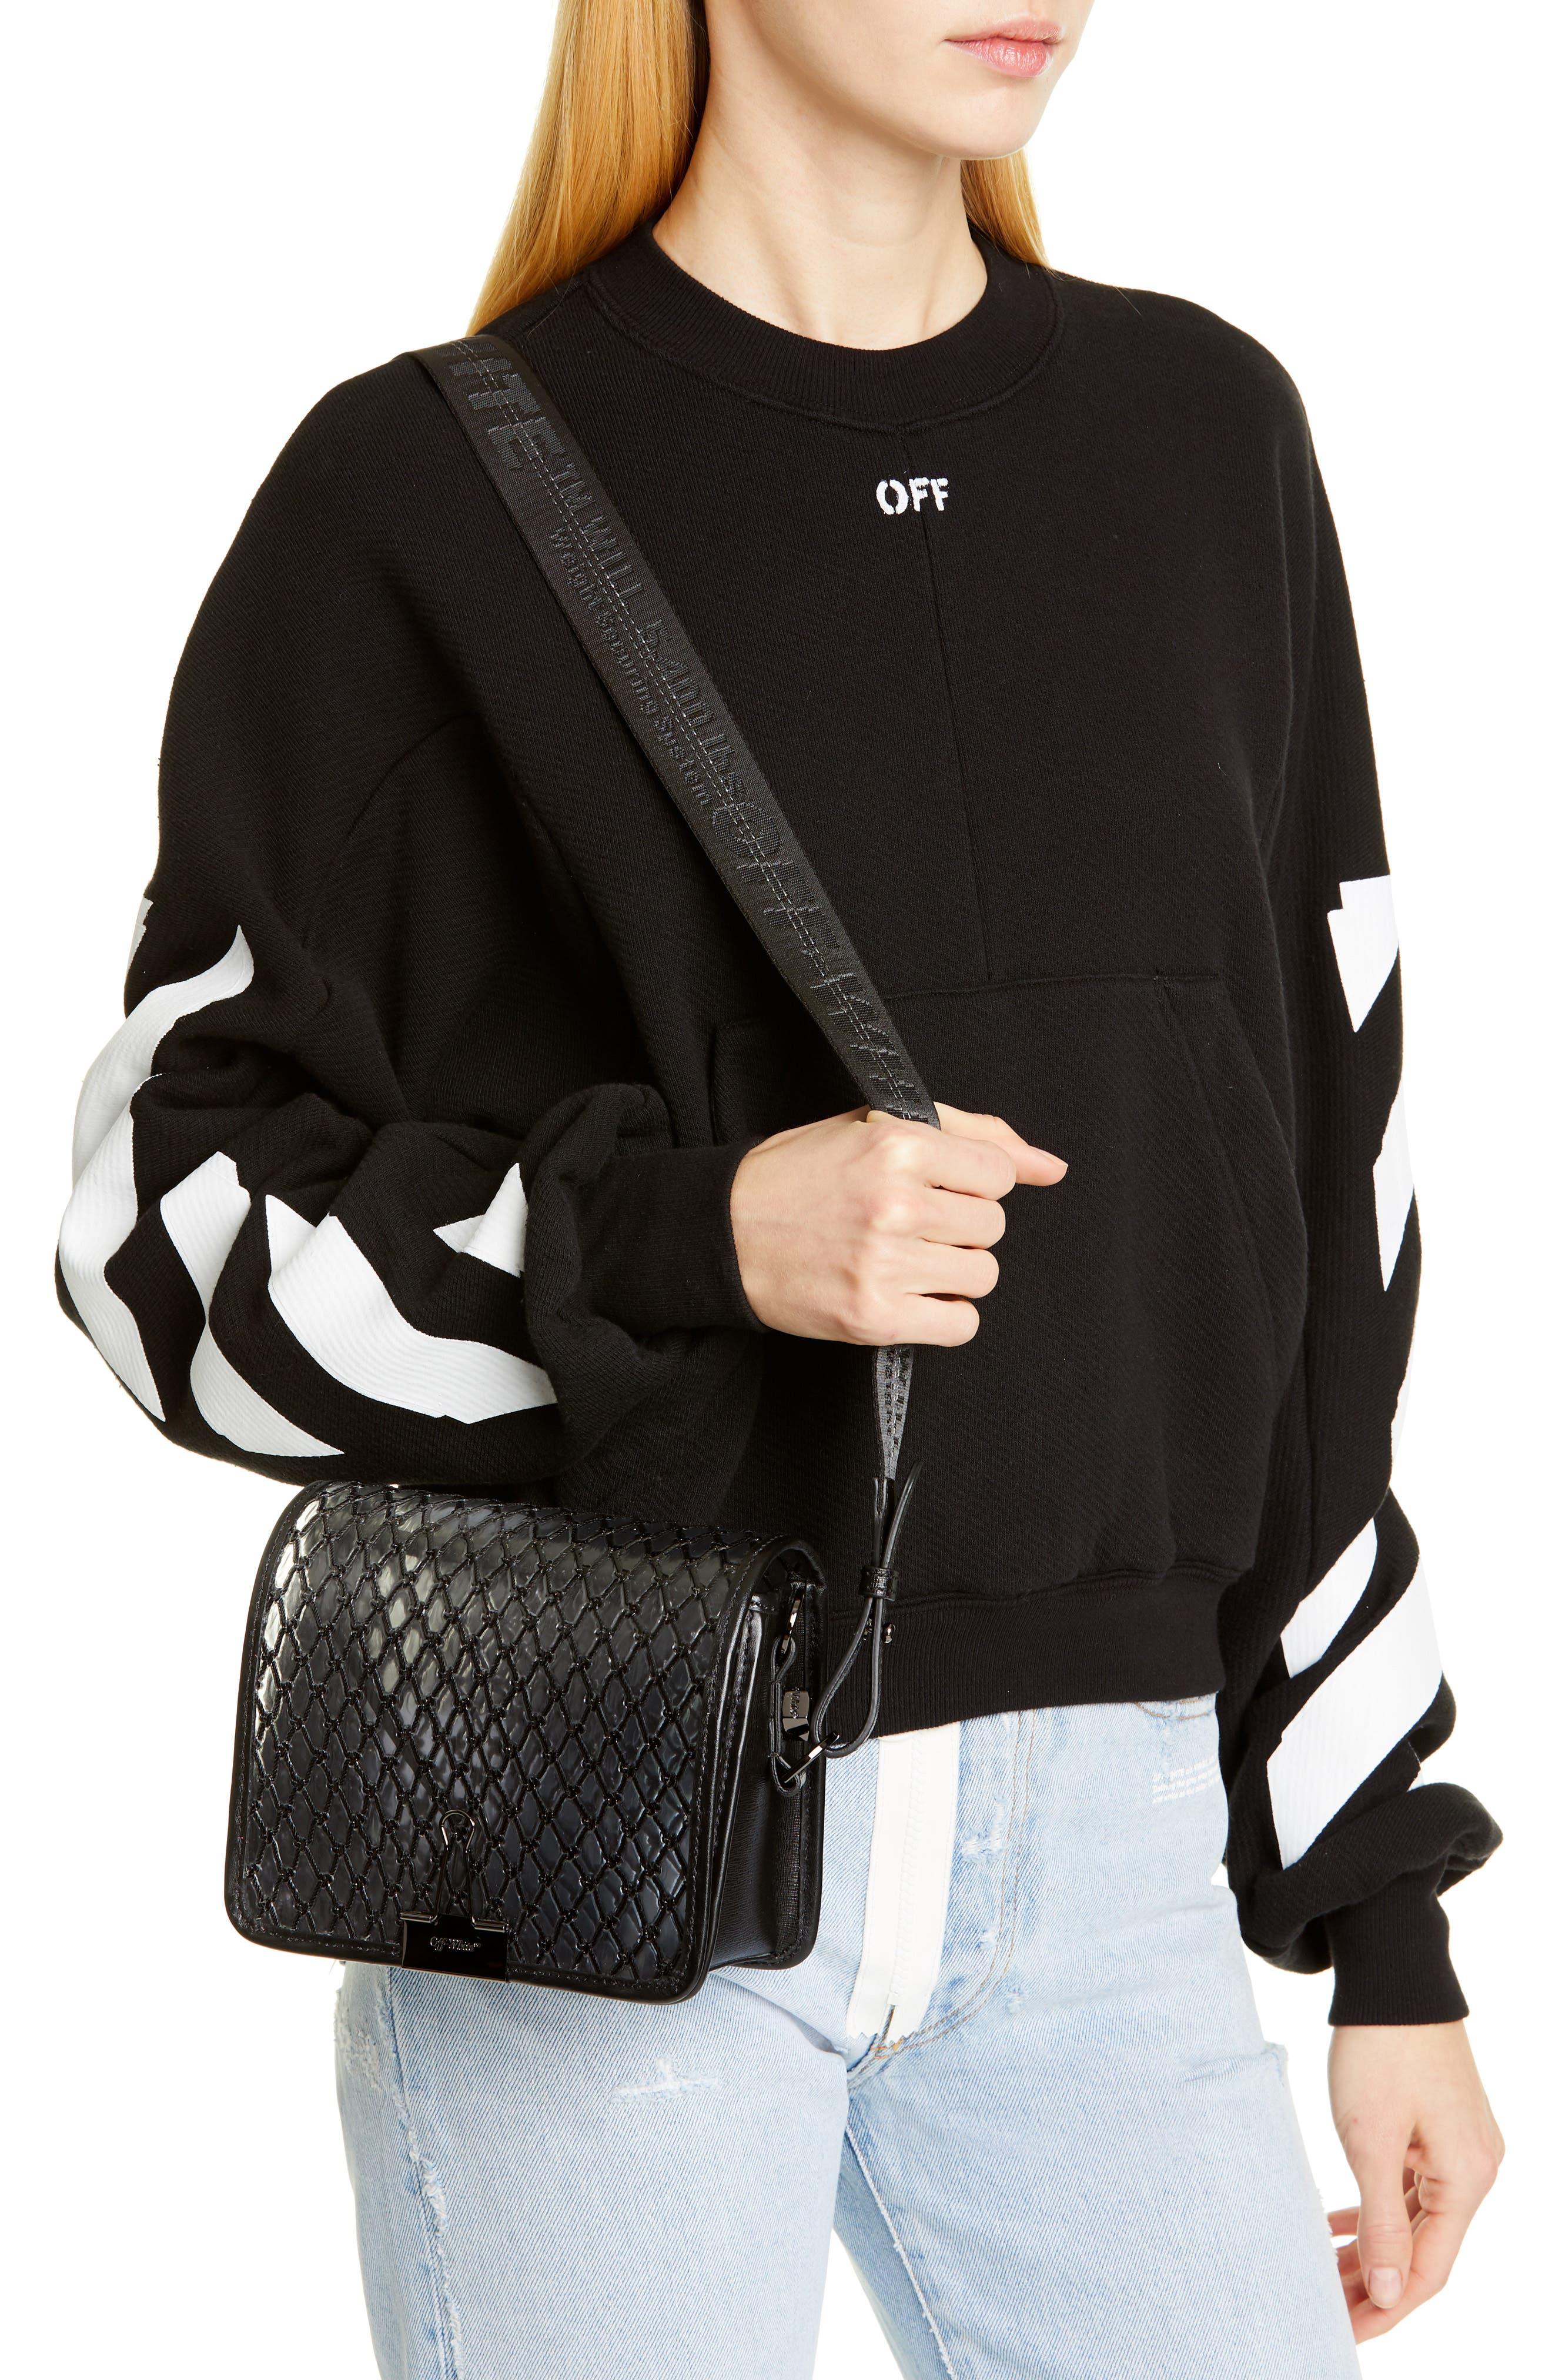 OFF-WHITE, Net PVC Flap Bag, Alternate thumbnail 2, color, BLACK